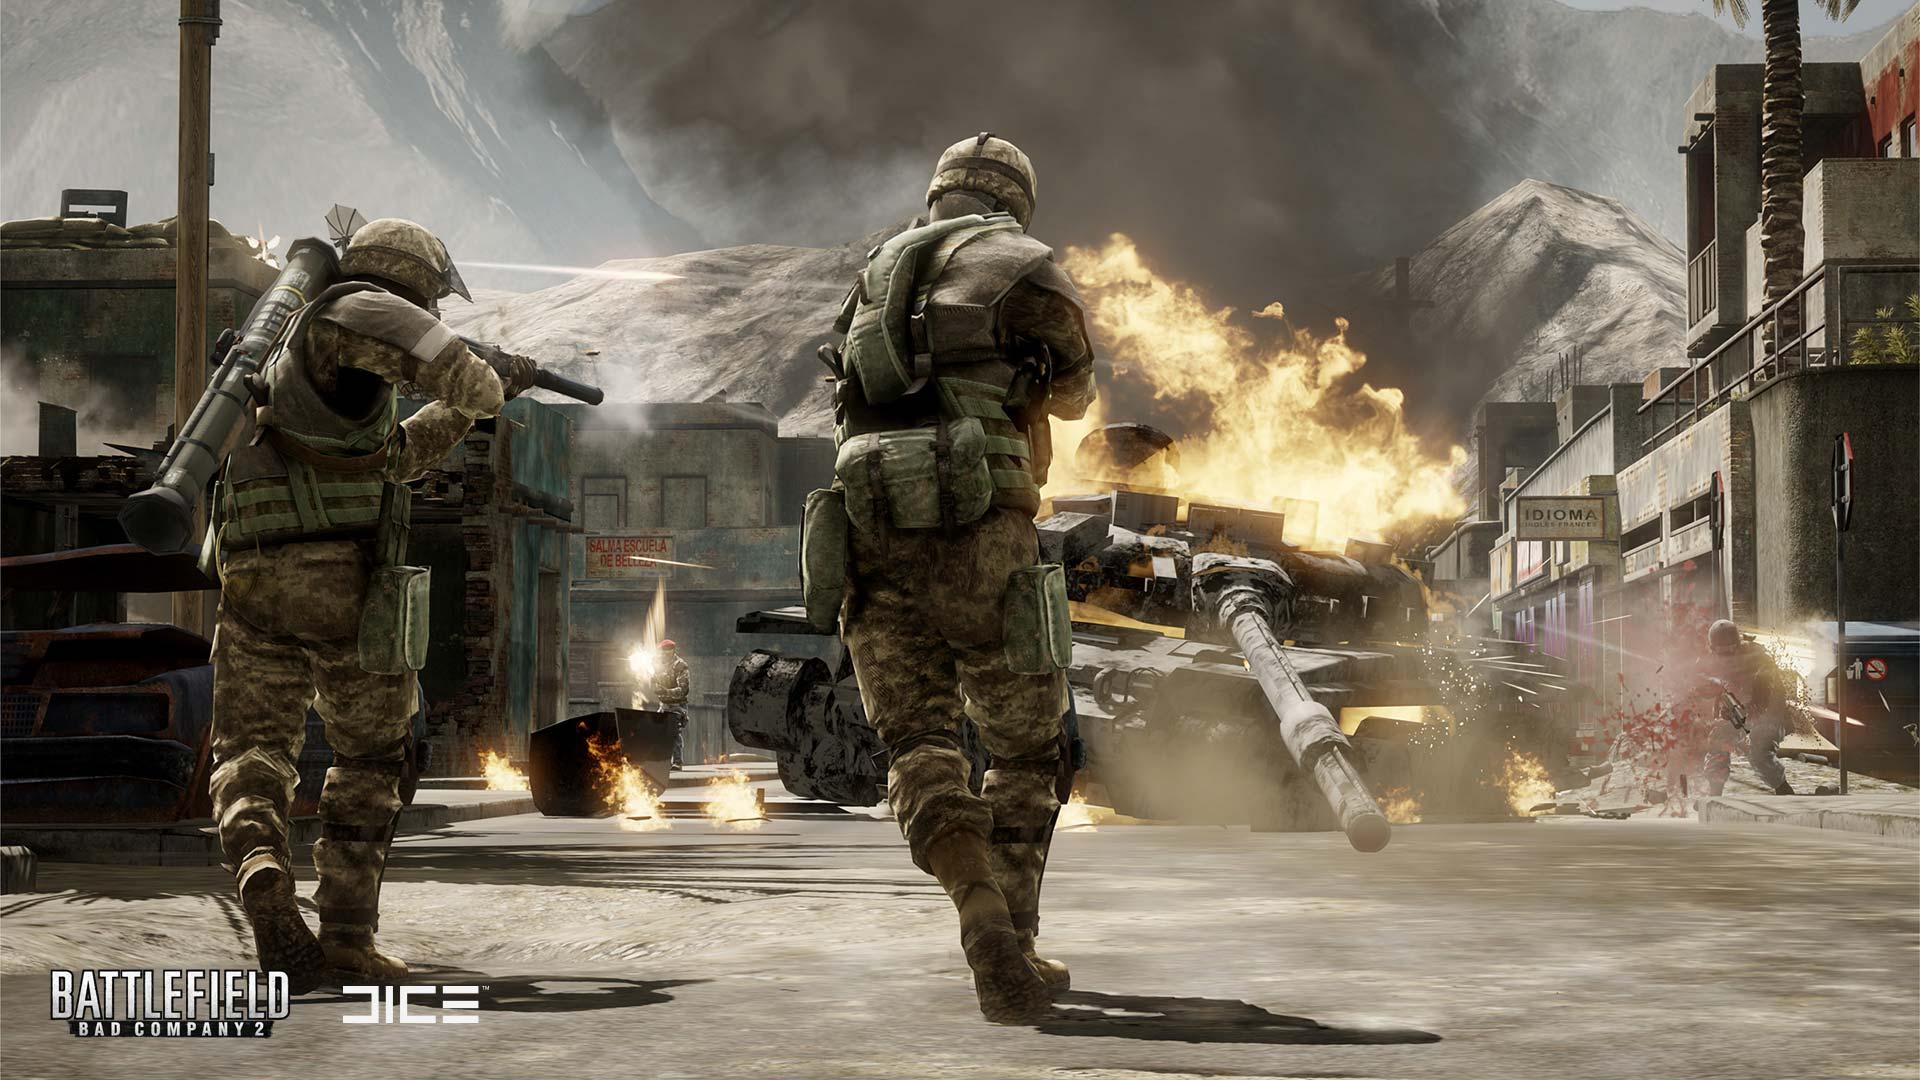 ea games battlefield bad company 2 update